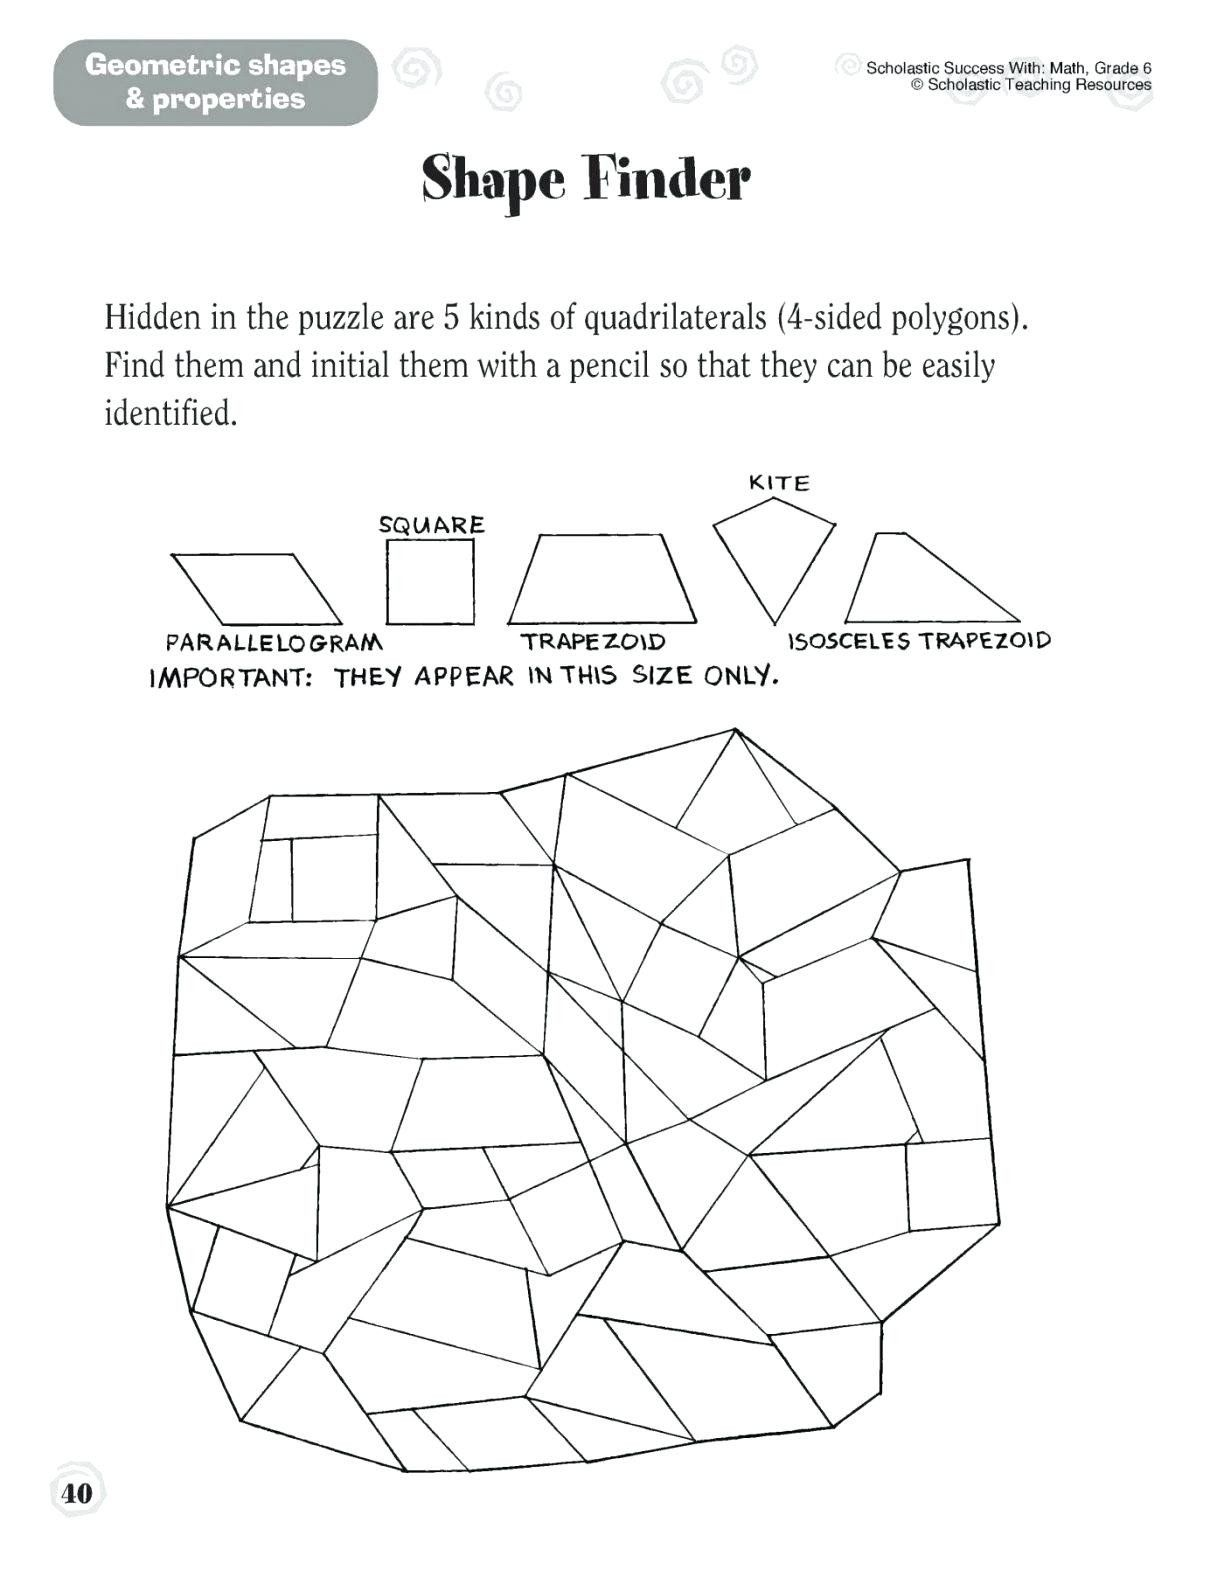 Thanksgiving Math Worksheet Kindergarten Thanksgiving Multiplication Worksheets 3rd Grade Education Math Geometry Worksheets Math Videos [ 1584 x 1224 Pixel ]